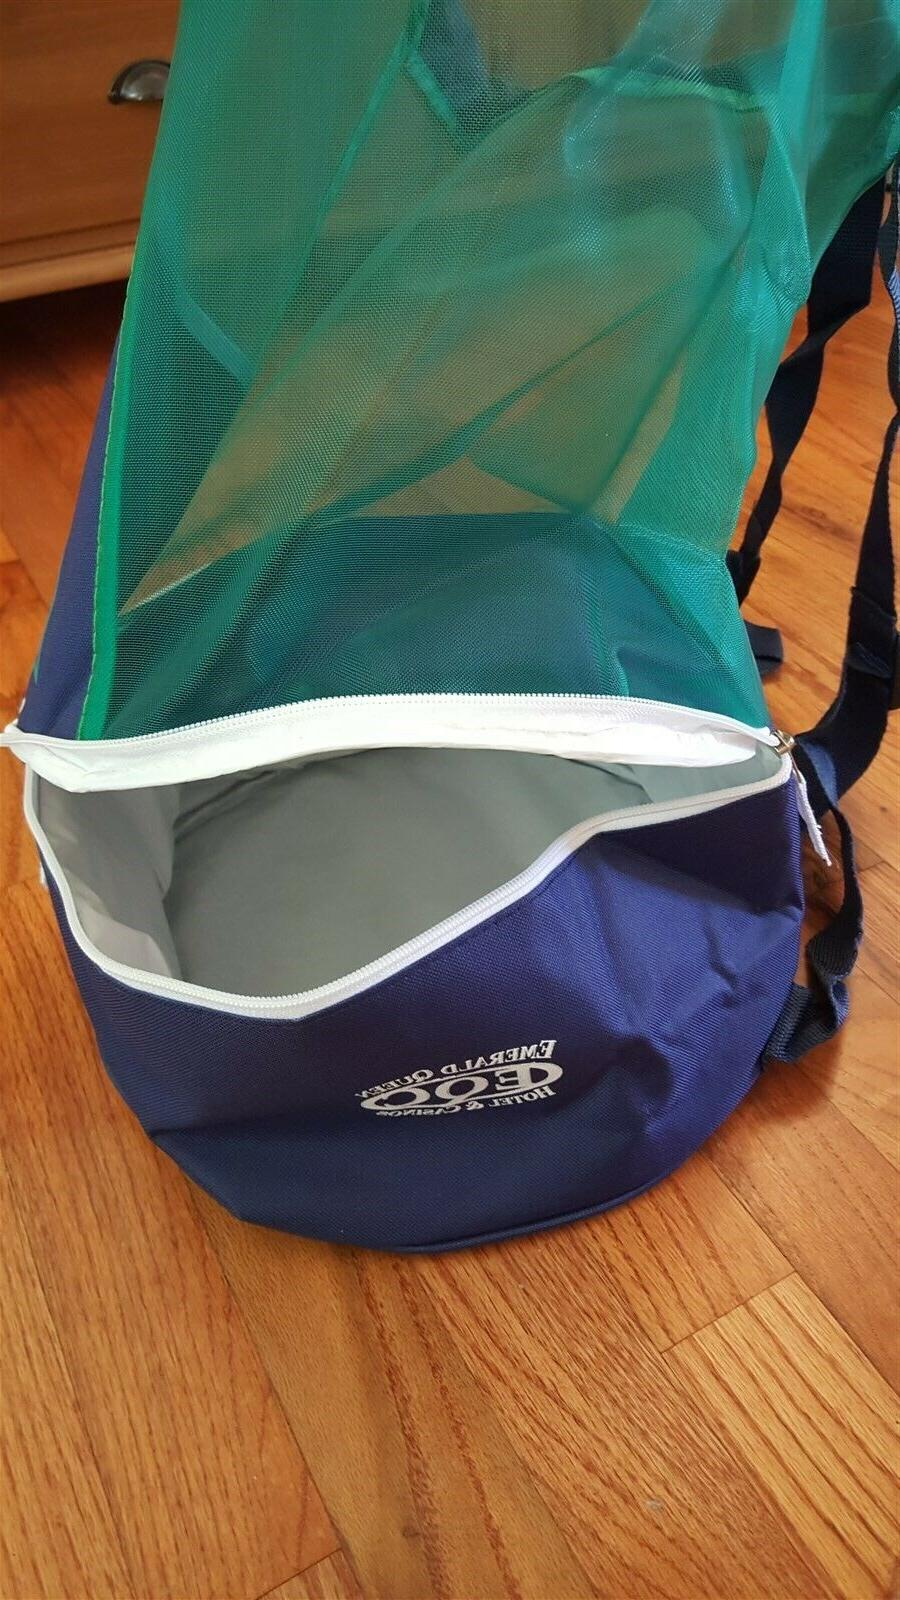 BackPack Cooler Mariners 2nd-Chance SGA